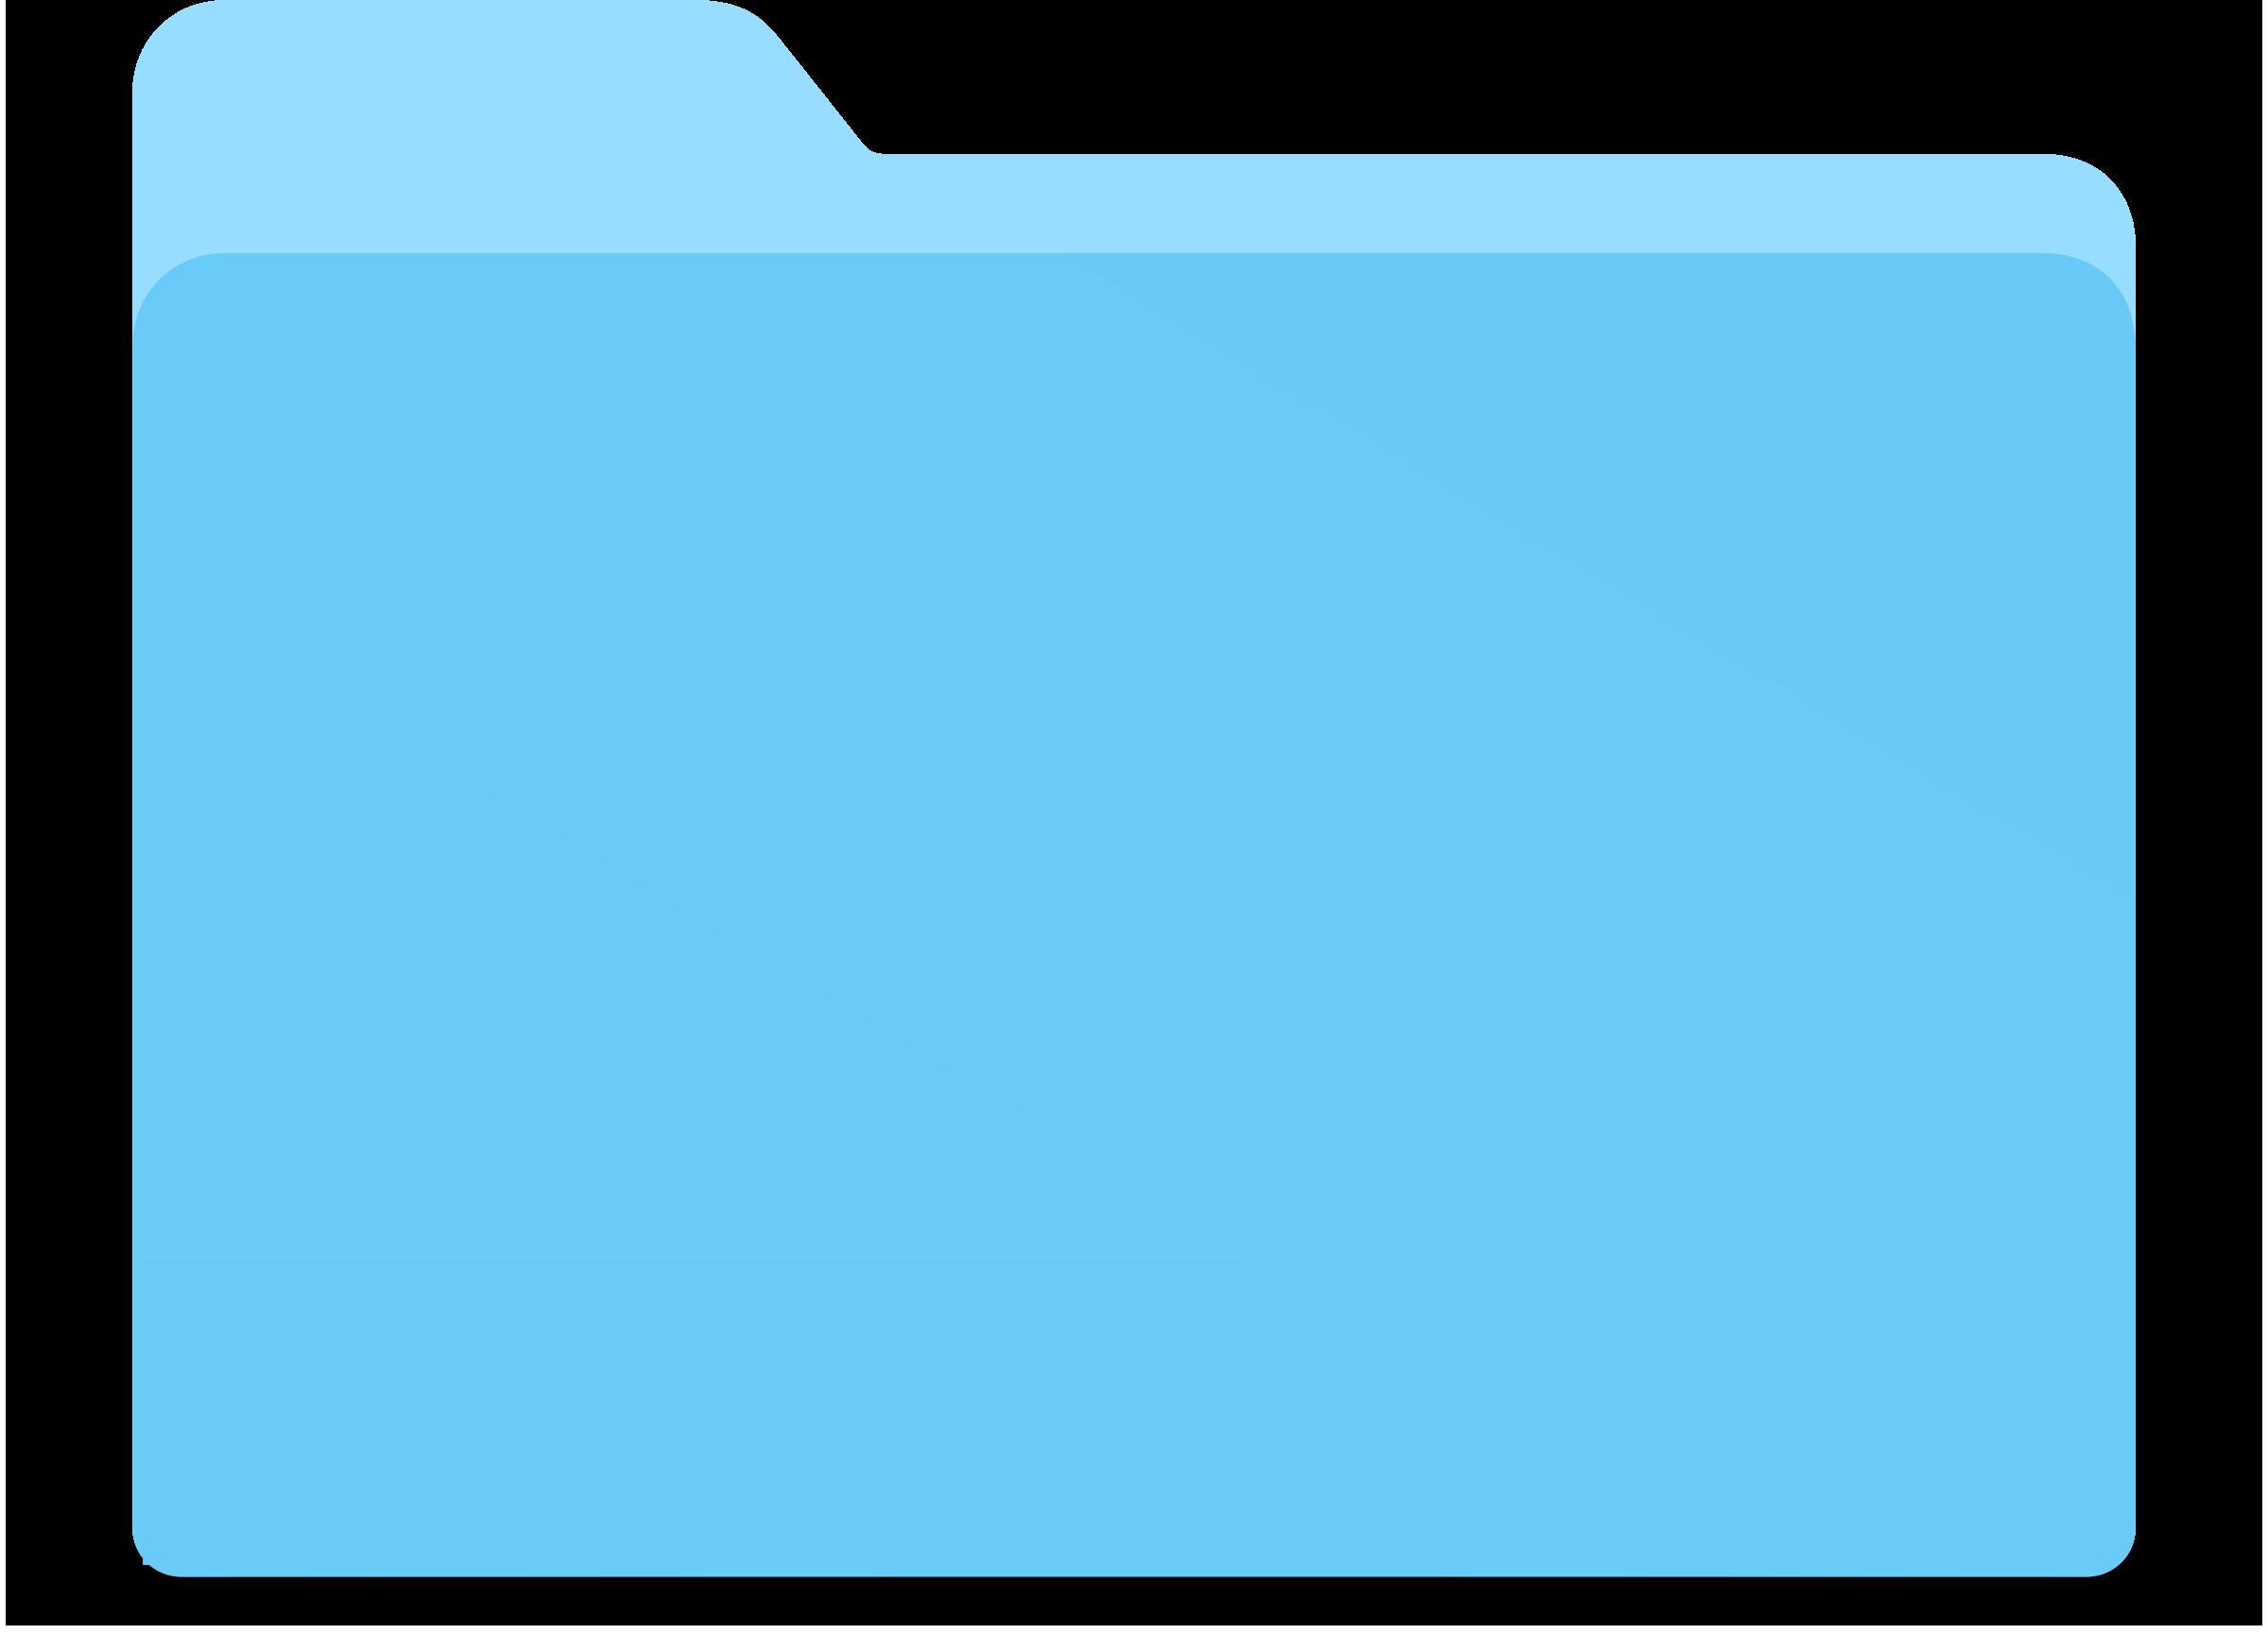 2400x1729 Blue Folder Vector Clipart Image